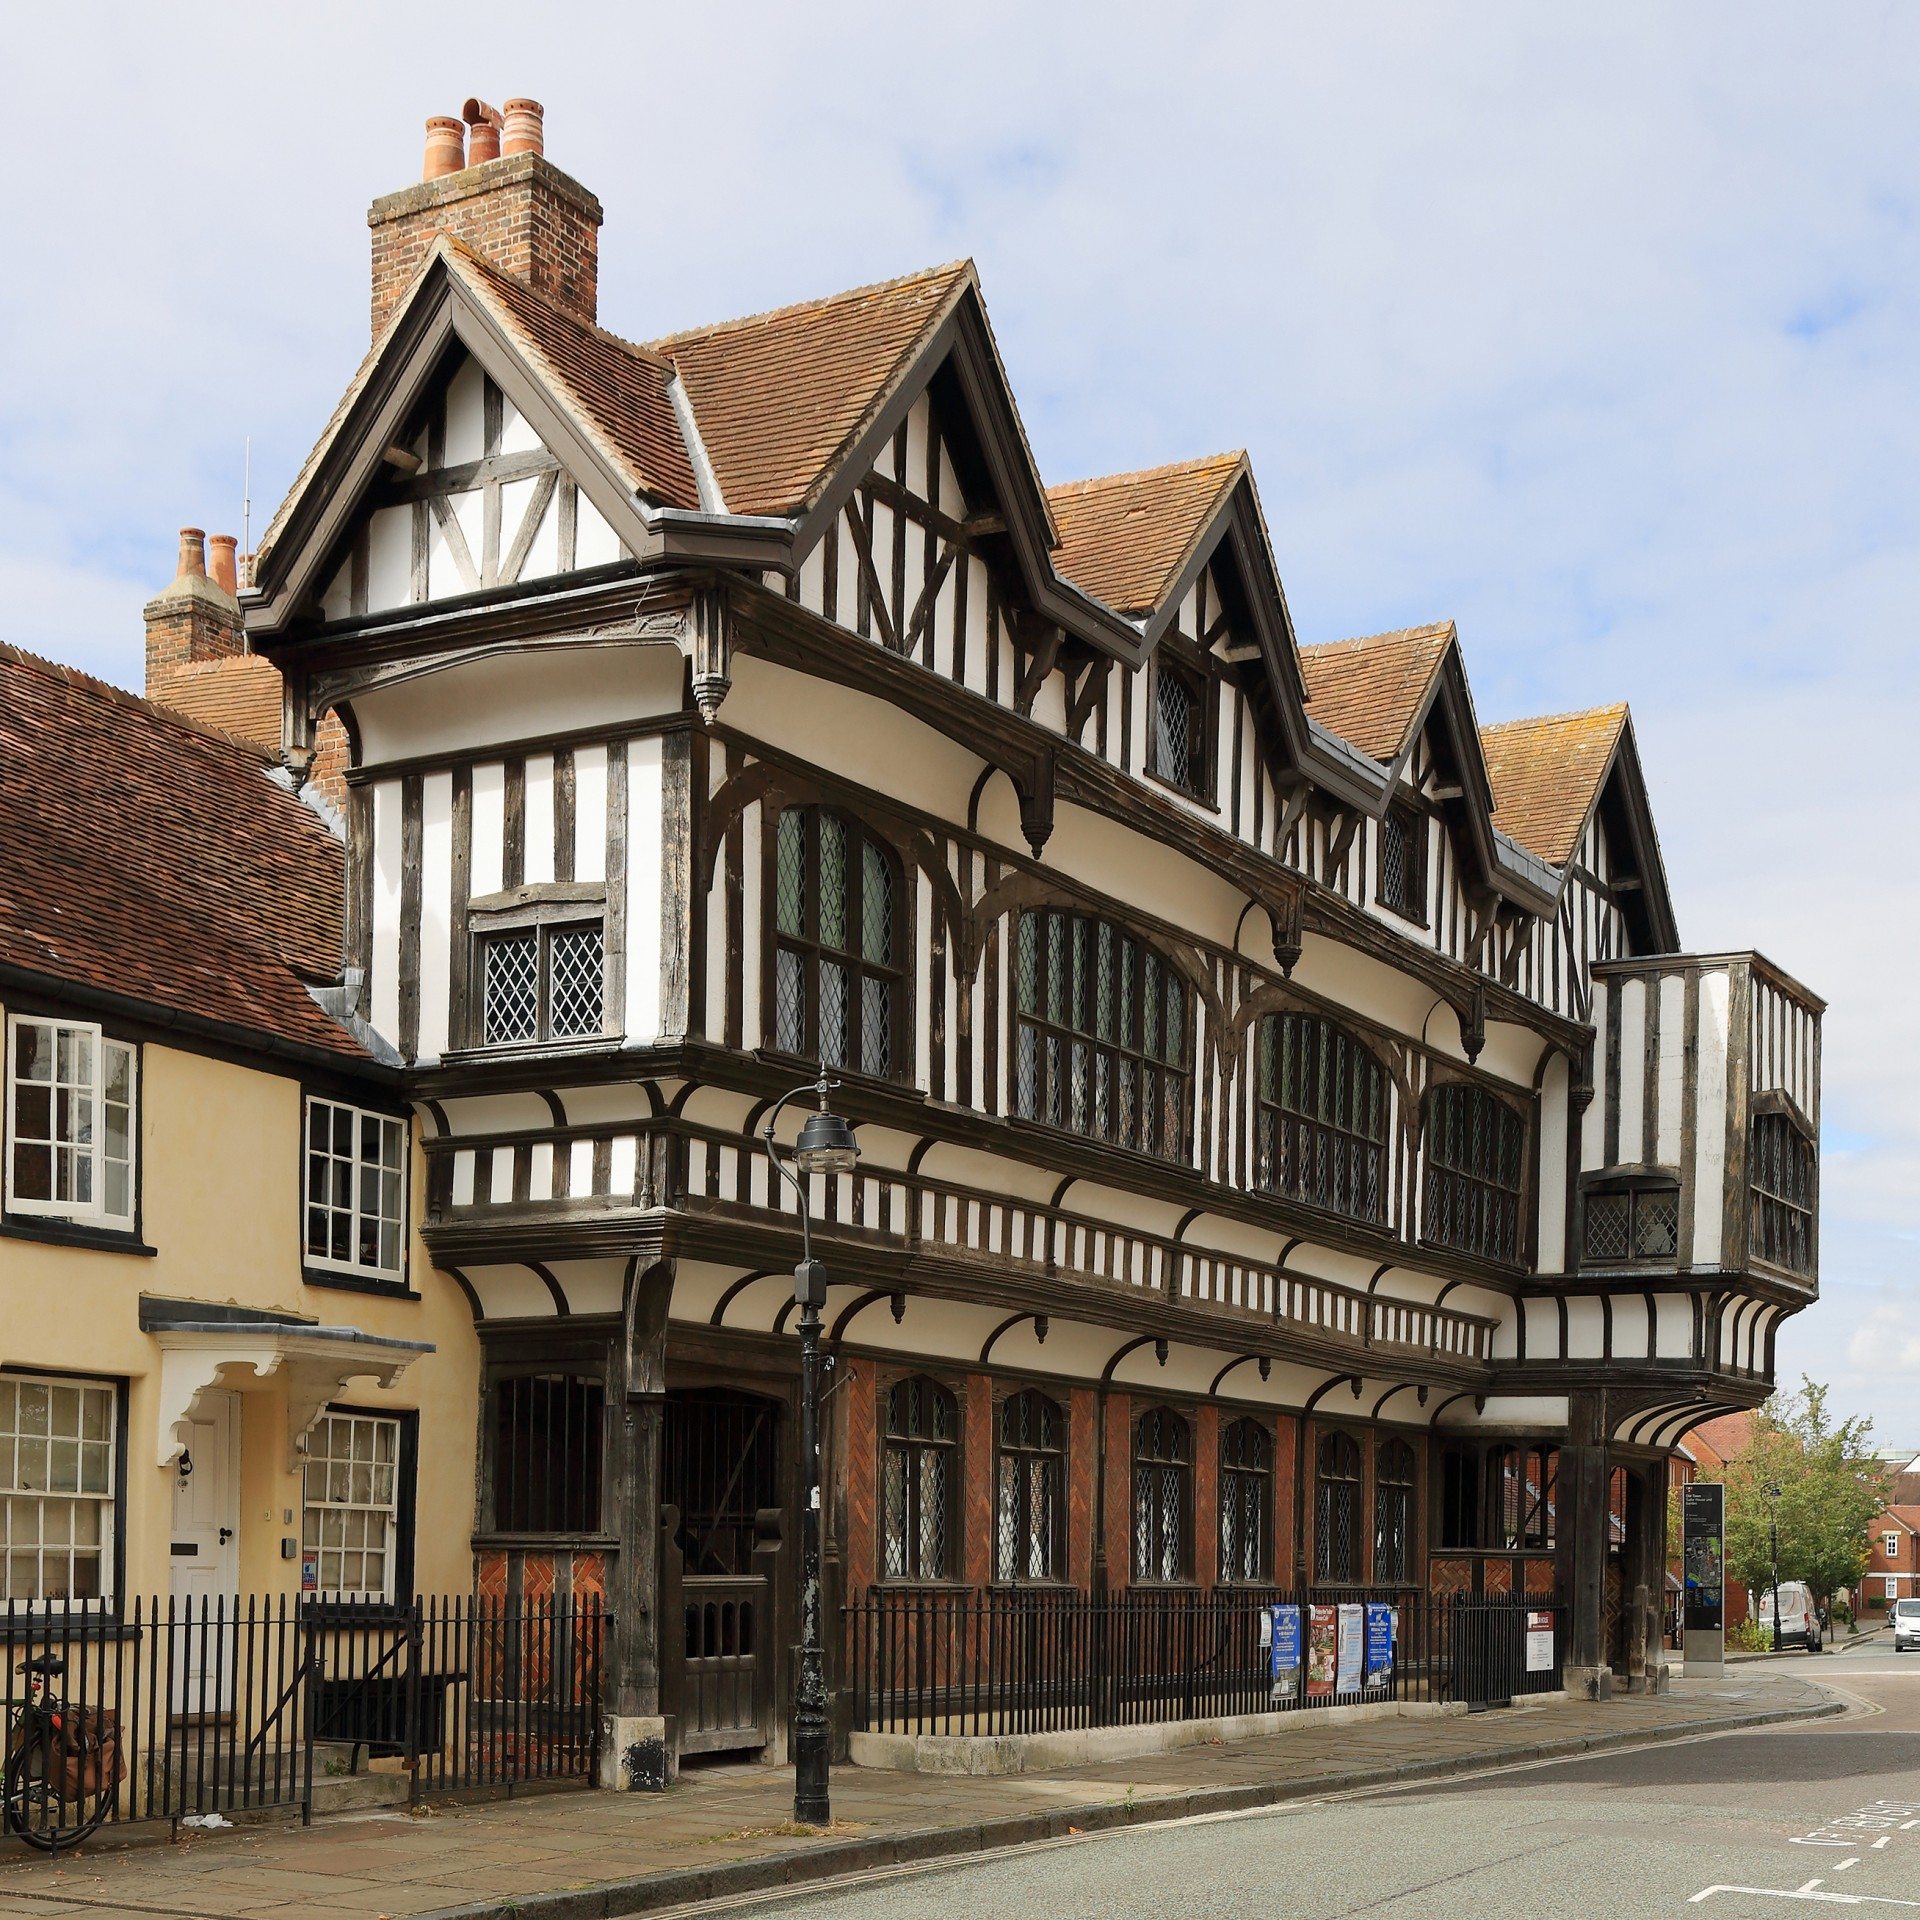 Haus im Tudorstil, Foto: Martin Falbisoner/ CC BY-SA